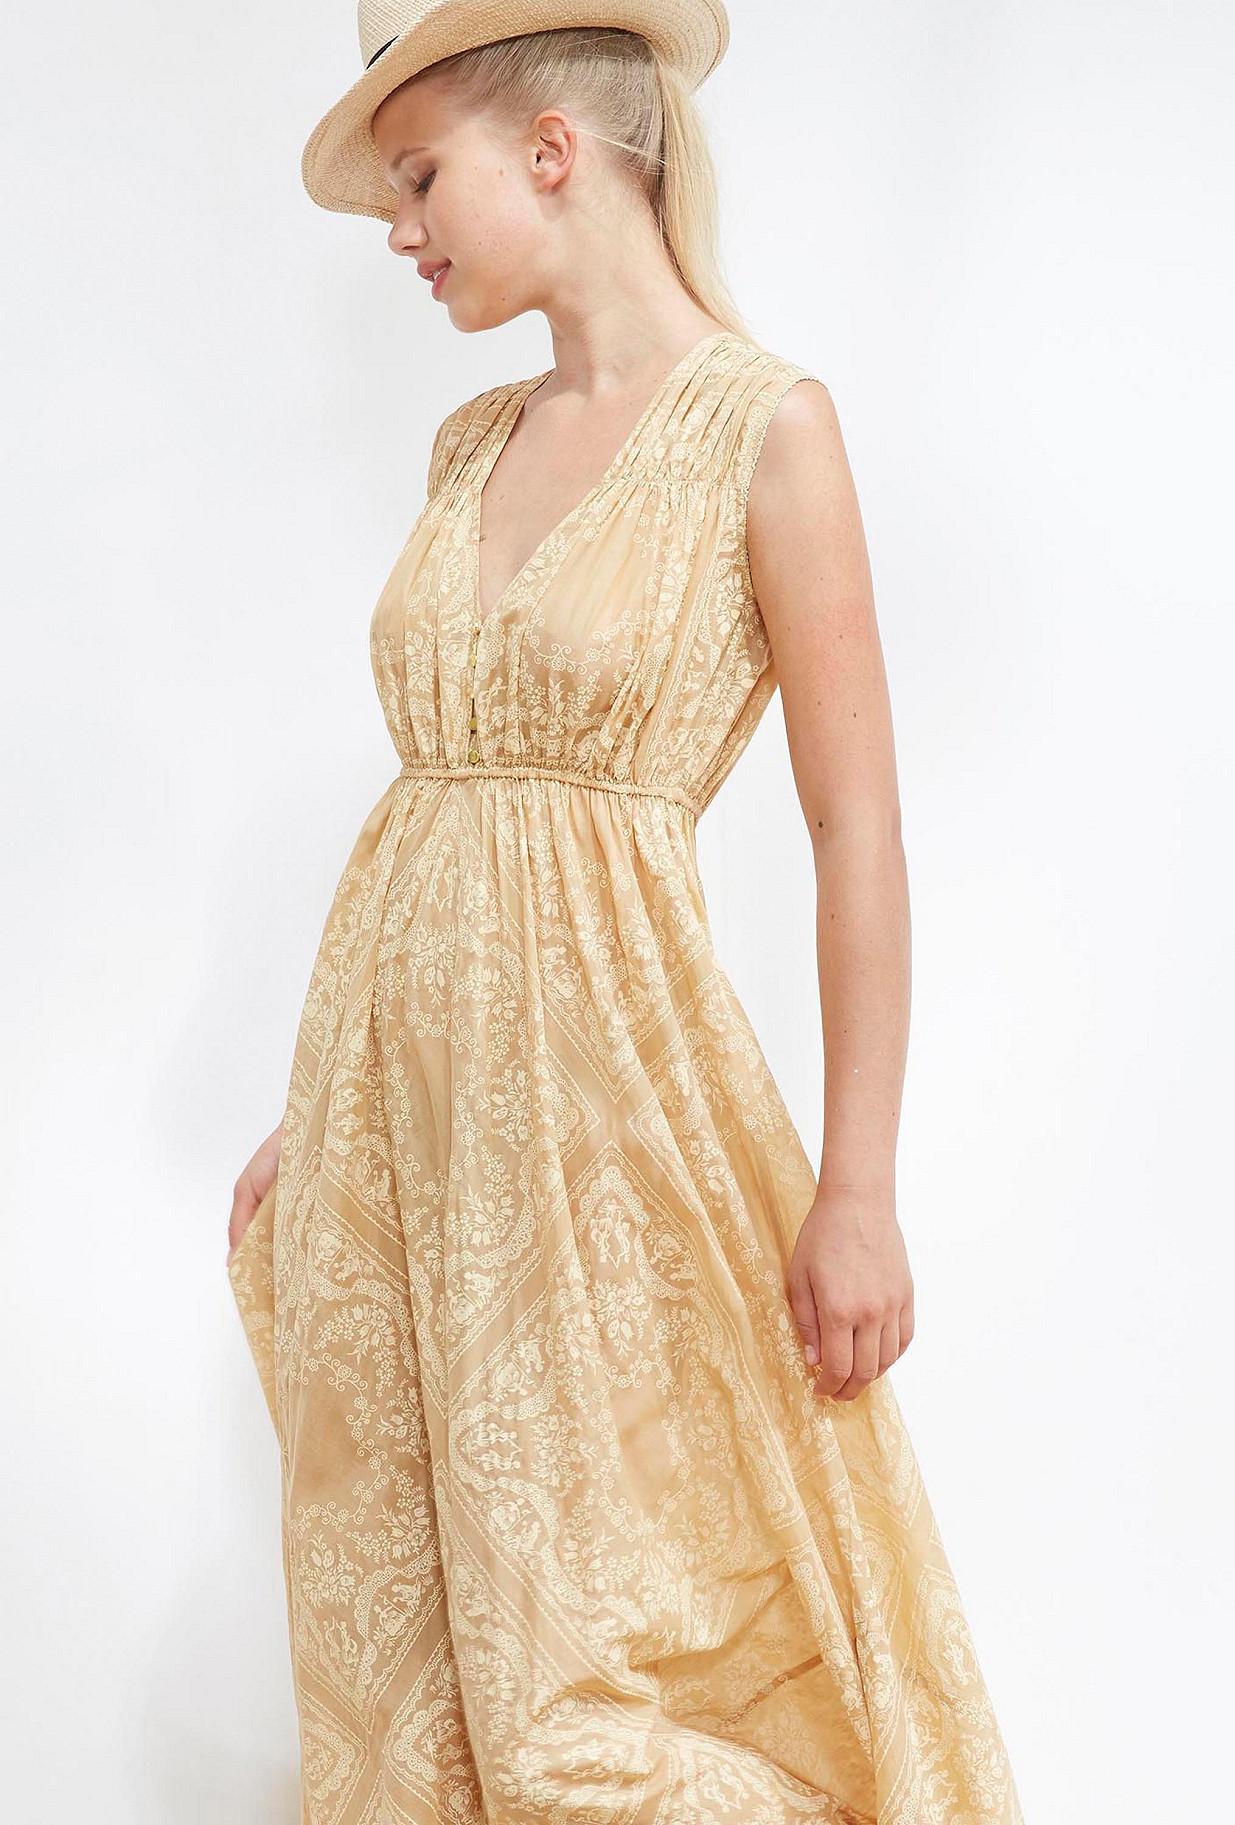 clothes store DRESS  Joyce french designer fashion Paris